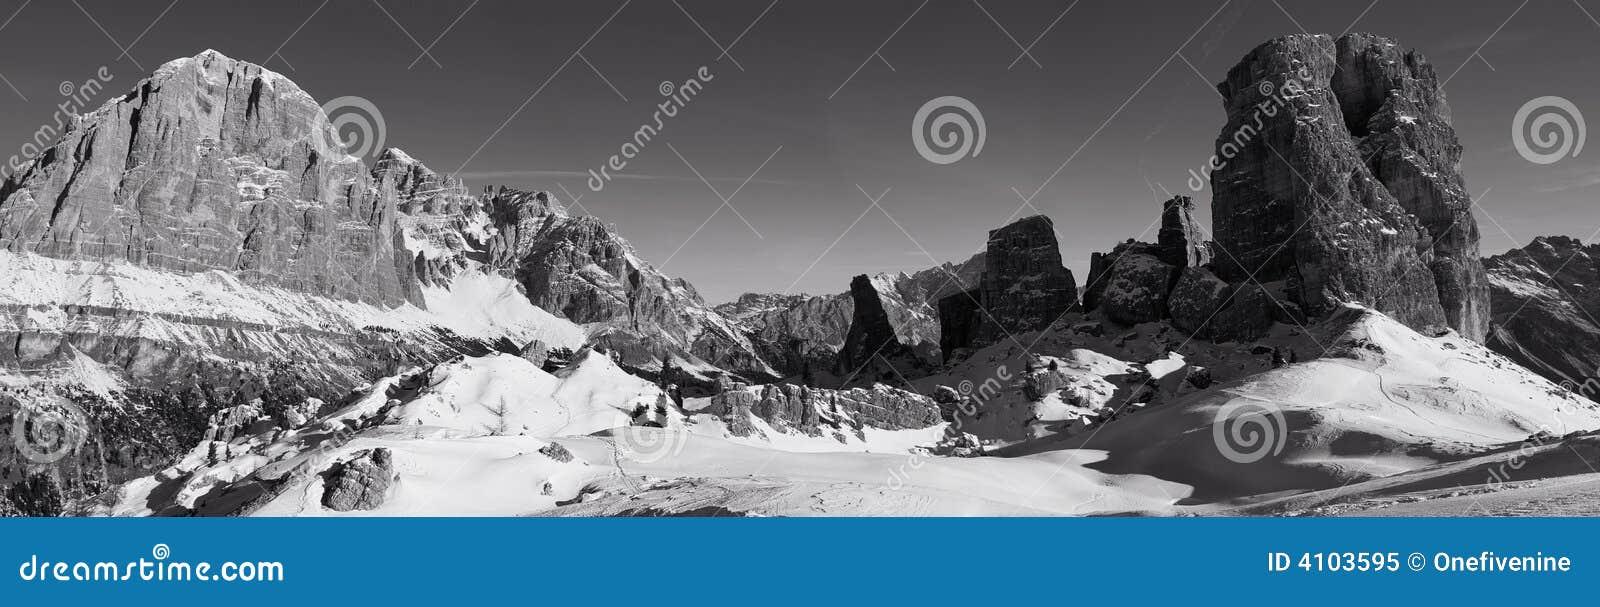 Panorama mono zimy dolomitu